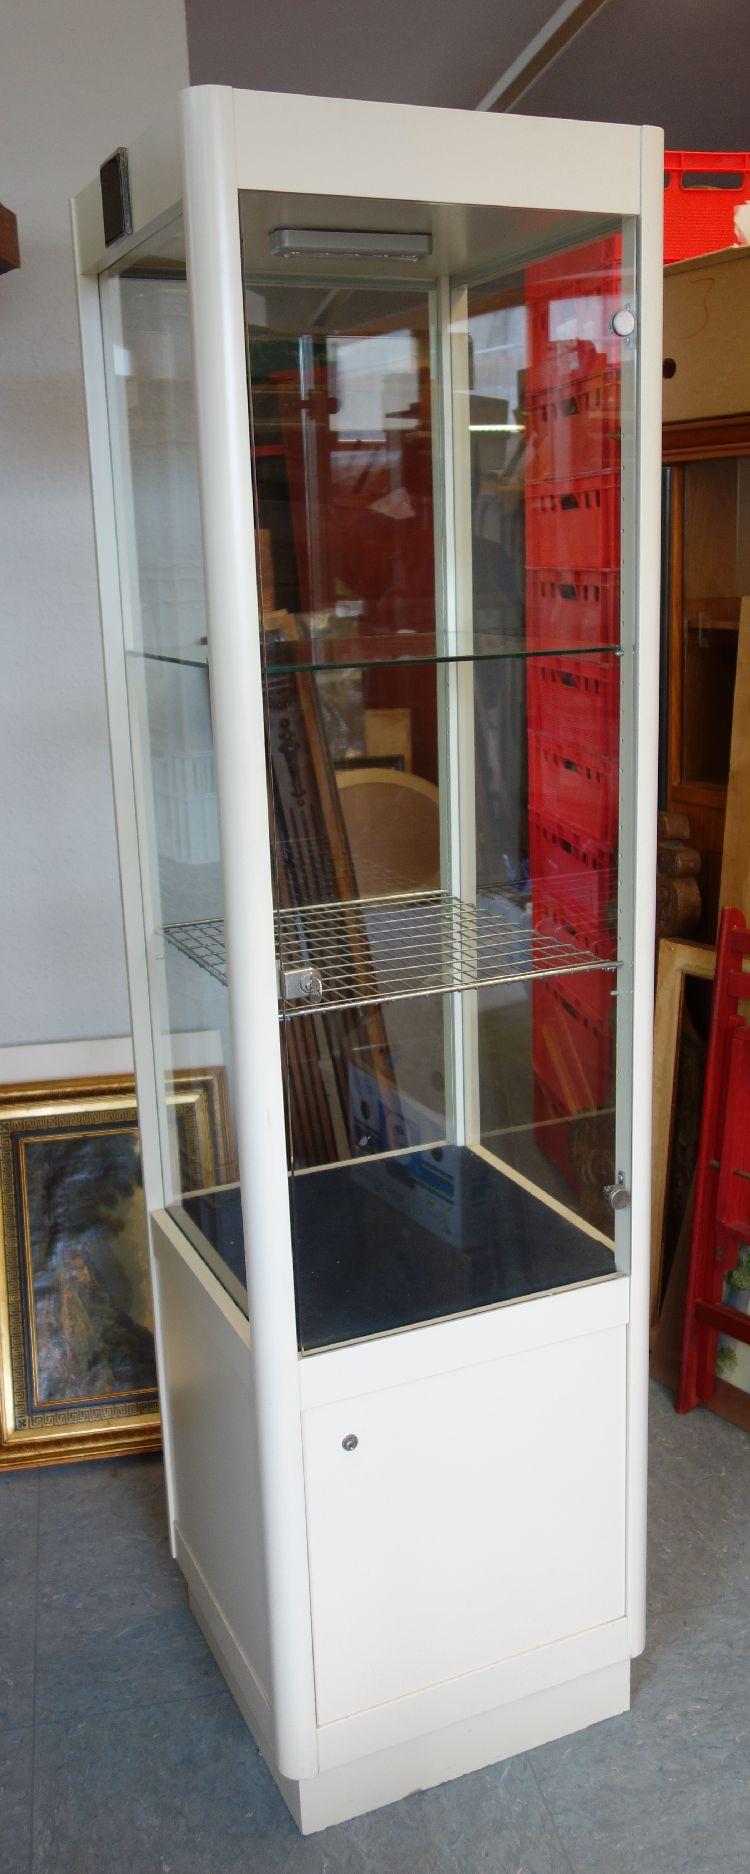 sch ne ladenvitrine schmuckvitrine glas vitrine abschlie bar sammlervitrine ebay. Black Bedroom Furniture Sets. Home Design Ideas